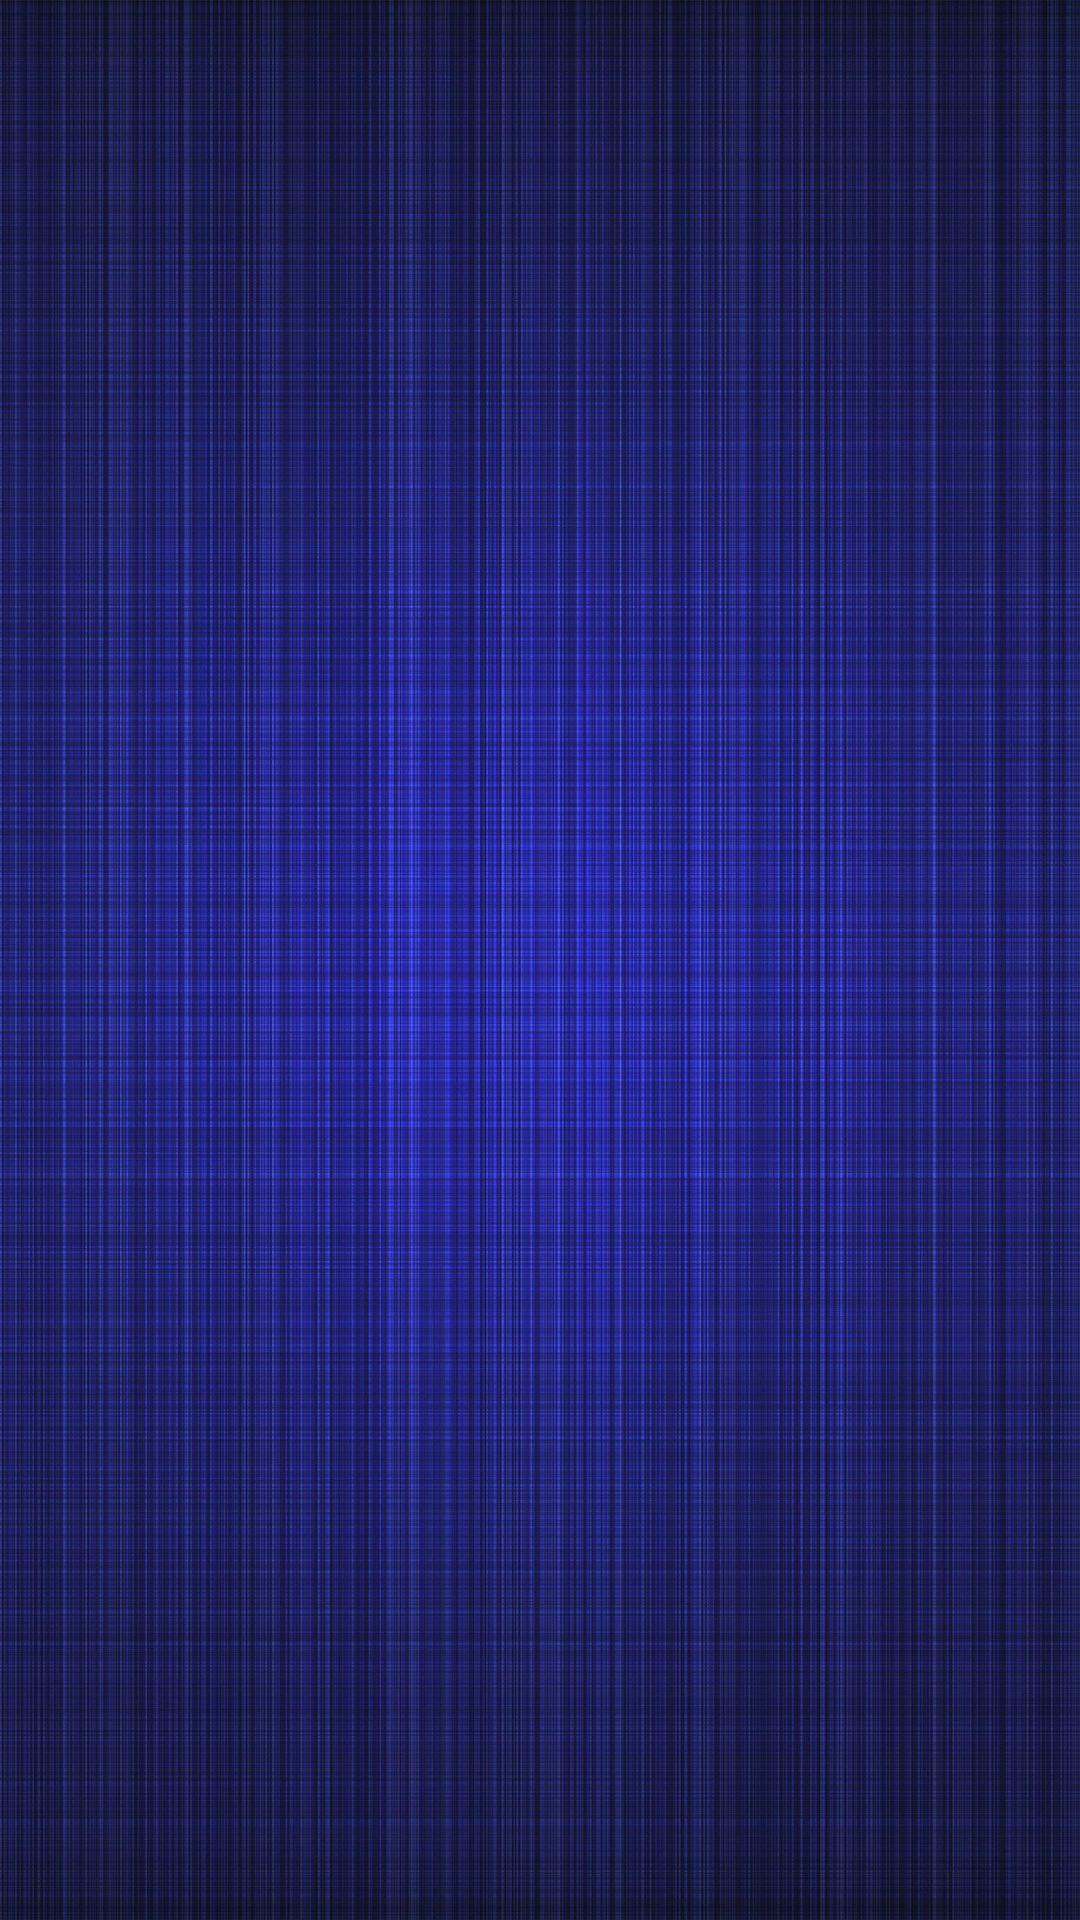 Linen Blue Dark Abstract Pattern